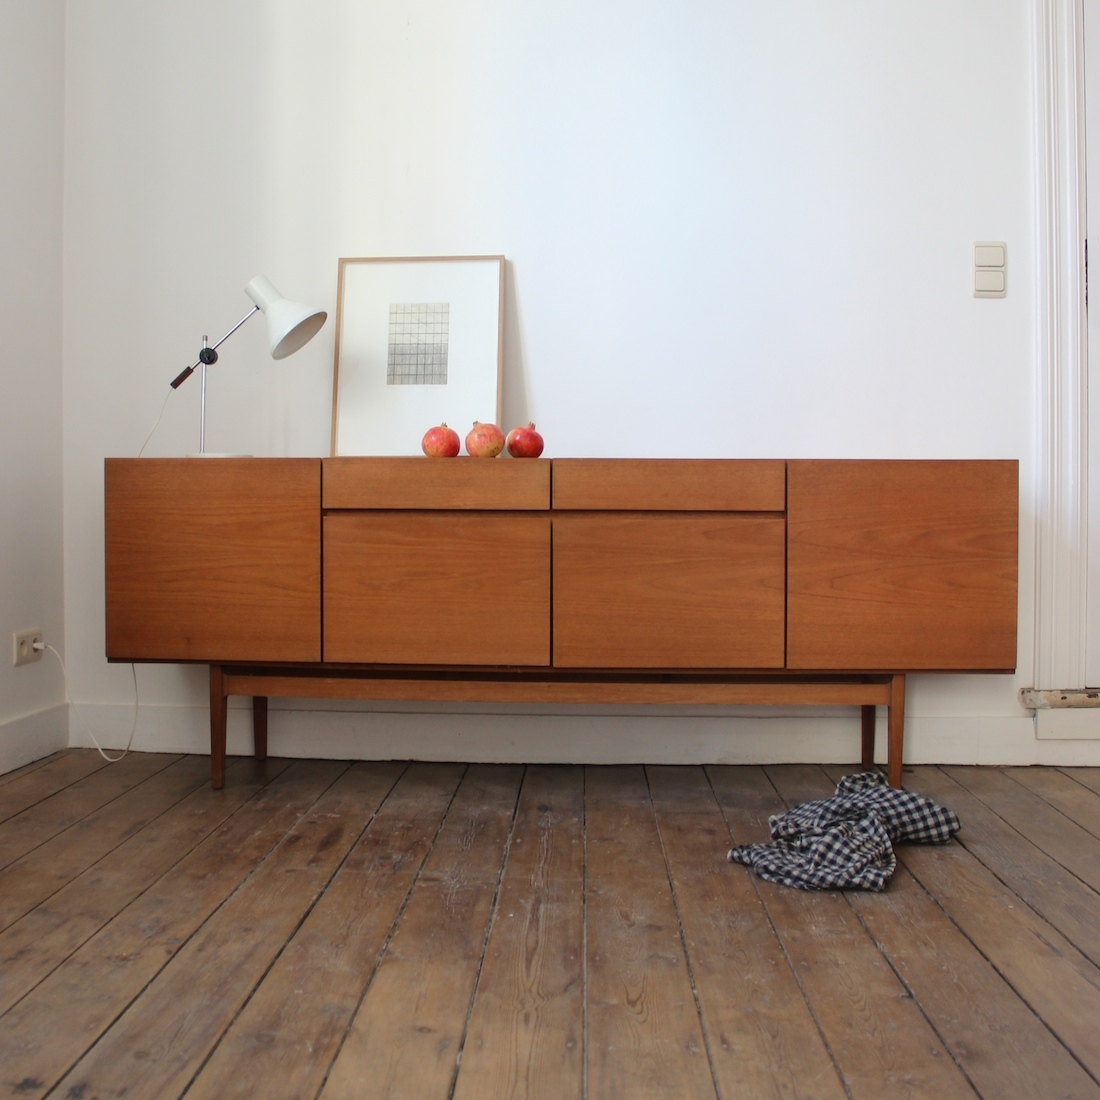 grande enfilade en teck la maison bruxelloise. Black Bedroom Furniture Sets. Home Design Ideas